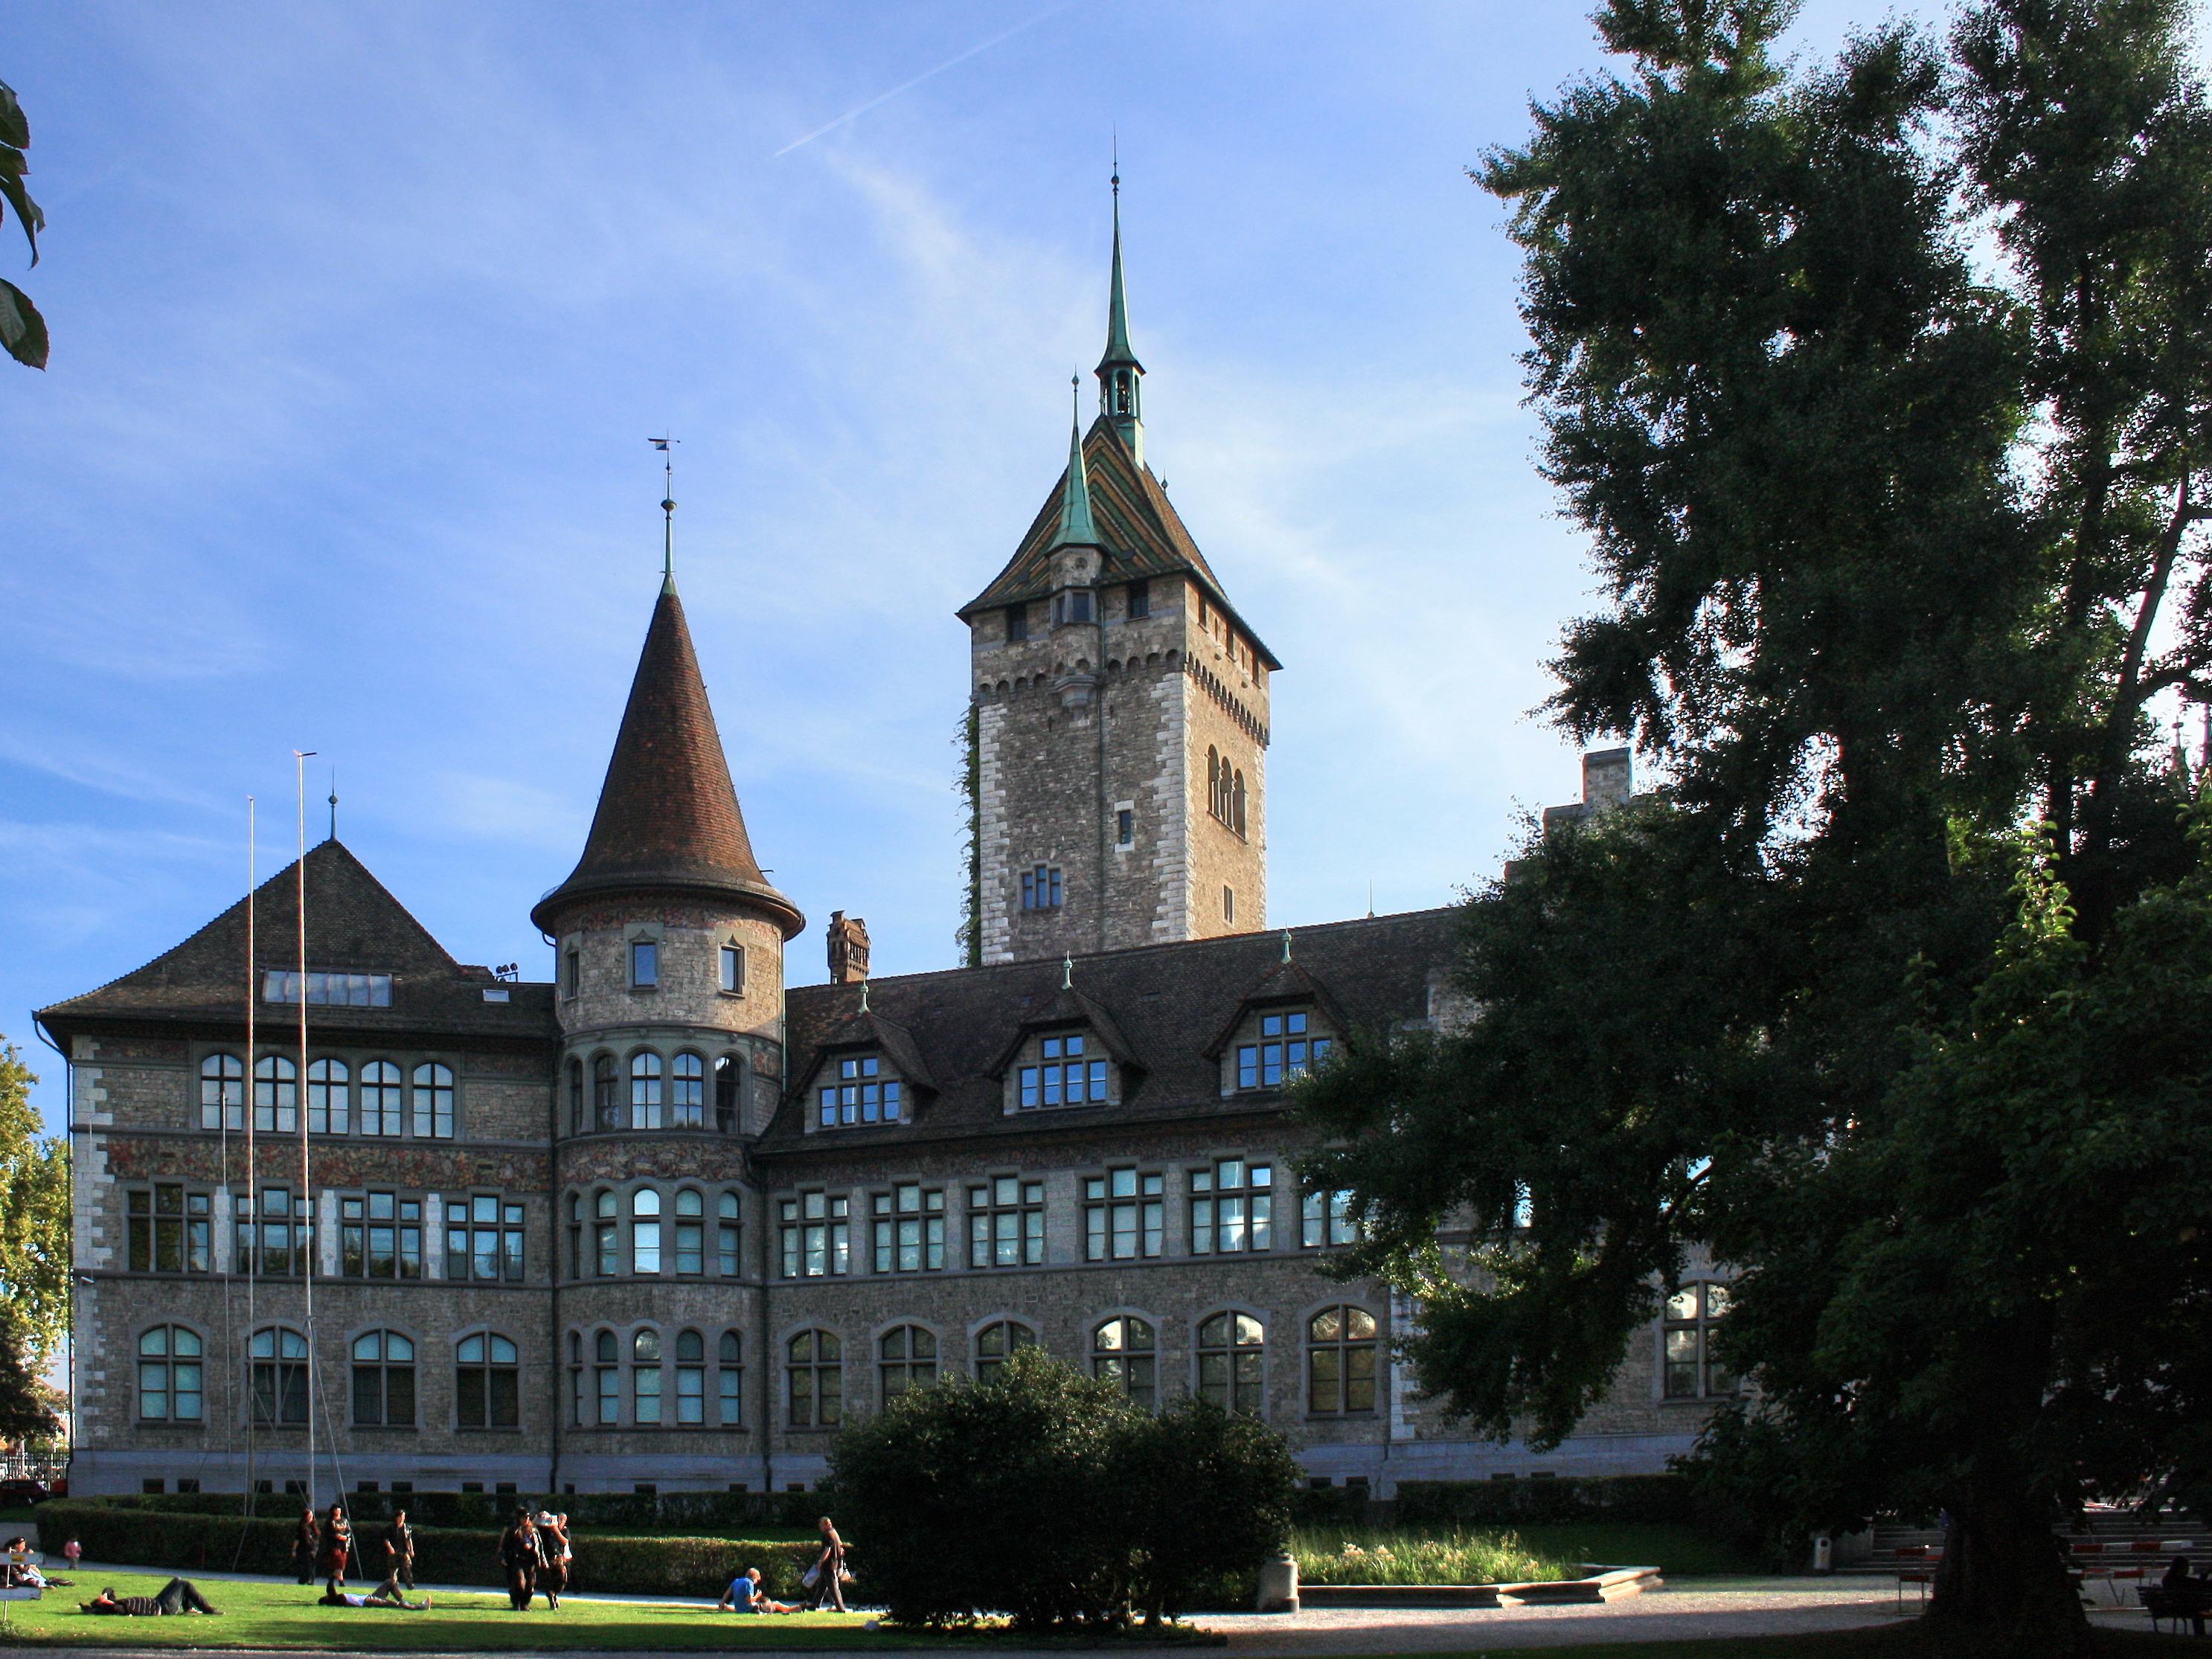 https://upload.wikimedia.org/wikipedia/commons/d/d5/Z%C3%BCrich_-_Landesmuseum_-_Platzspitzpark_IMG_1254_ShiftN.jpg